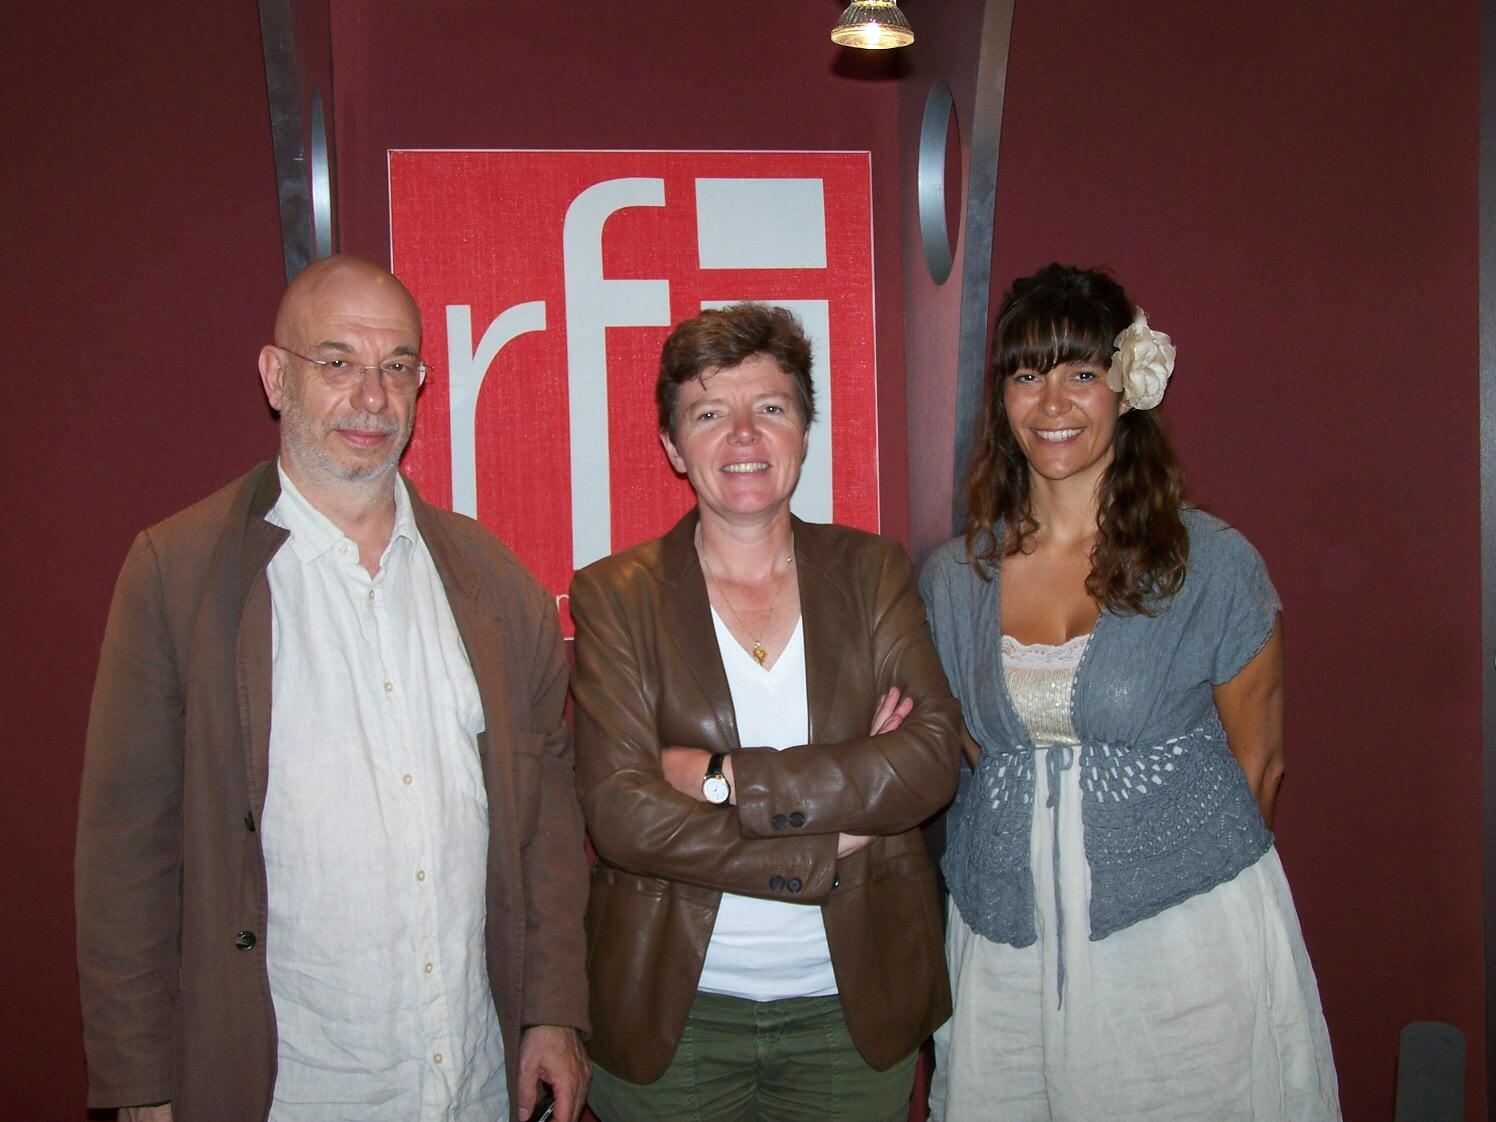 Philippe Chambon, Carole Chatelain et Emilie Martin